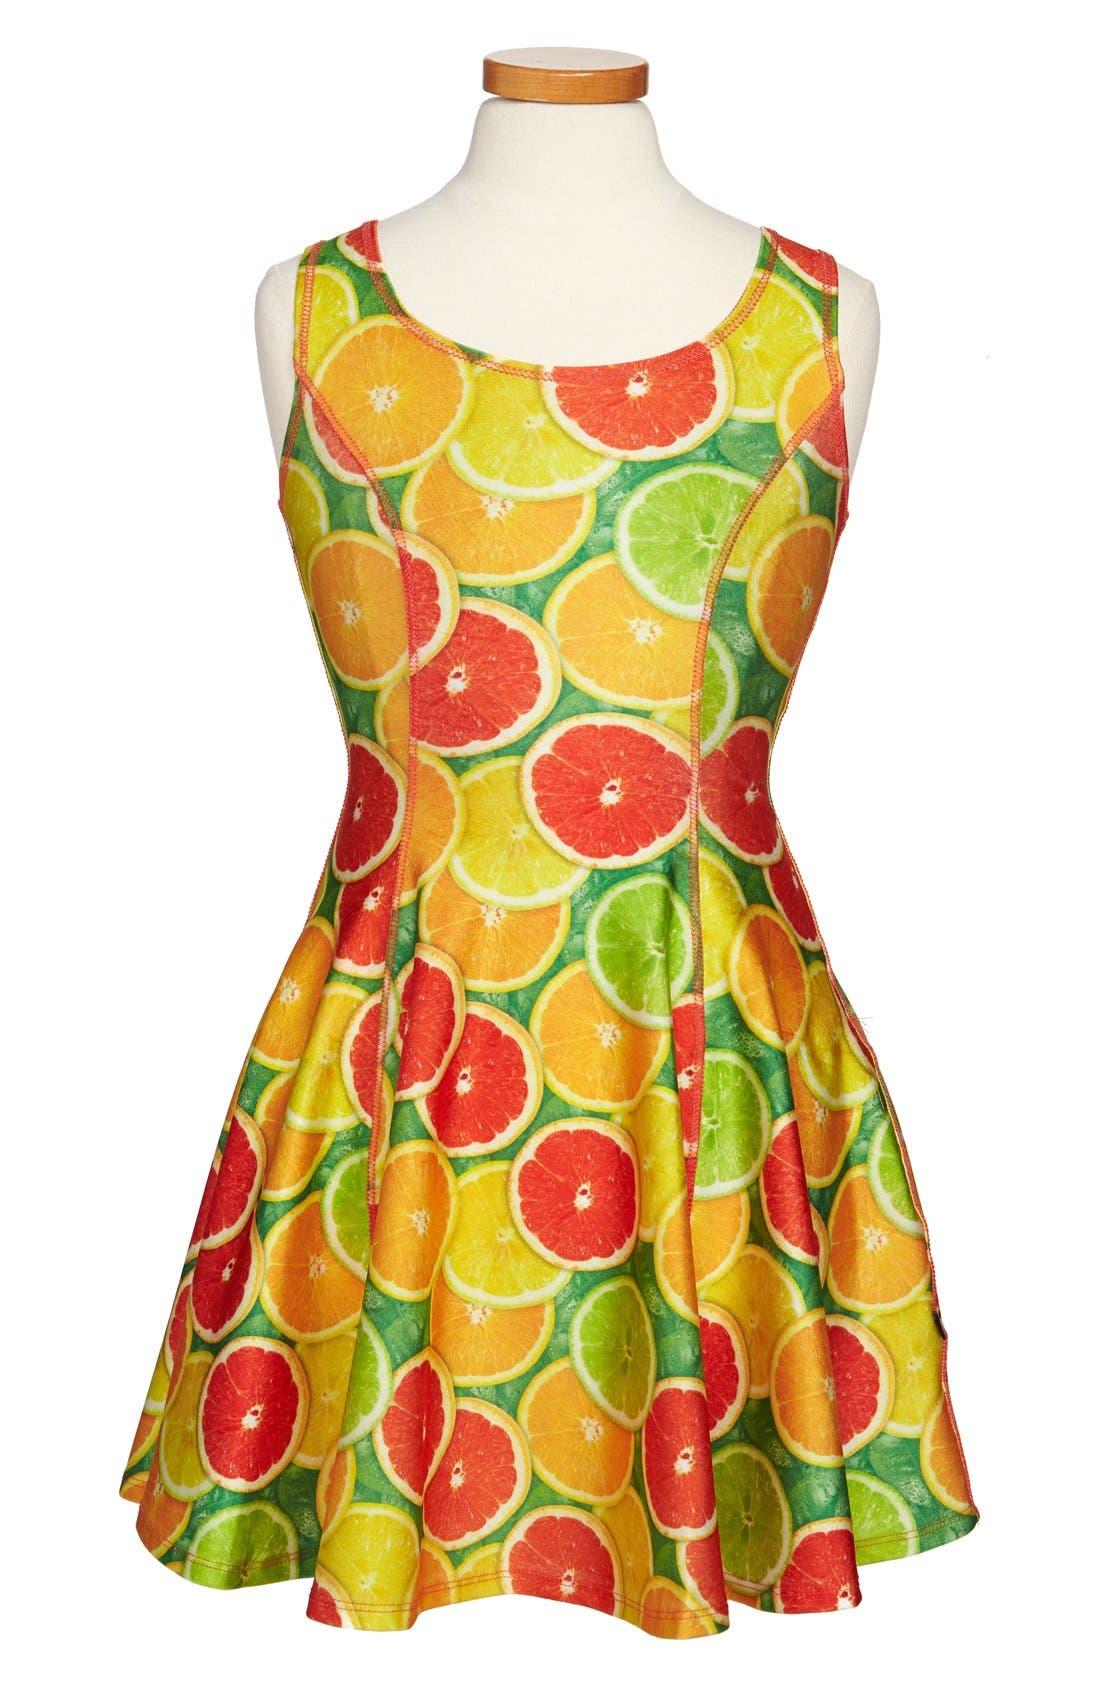 Alternate Image 1 Selected - Terez 'Citrus' Skater Dress (Big Girls)